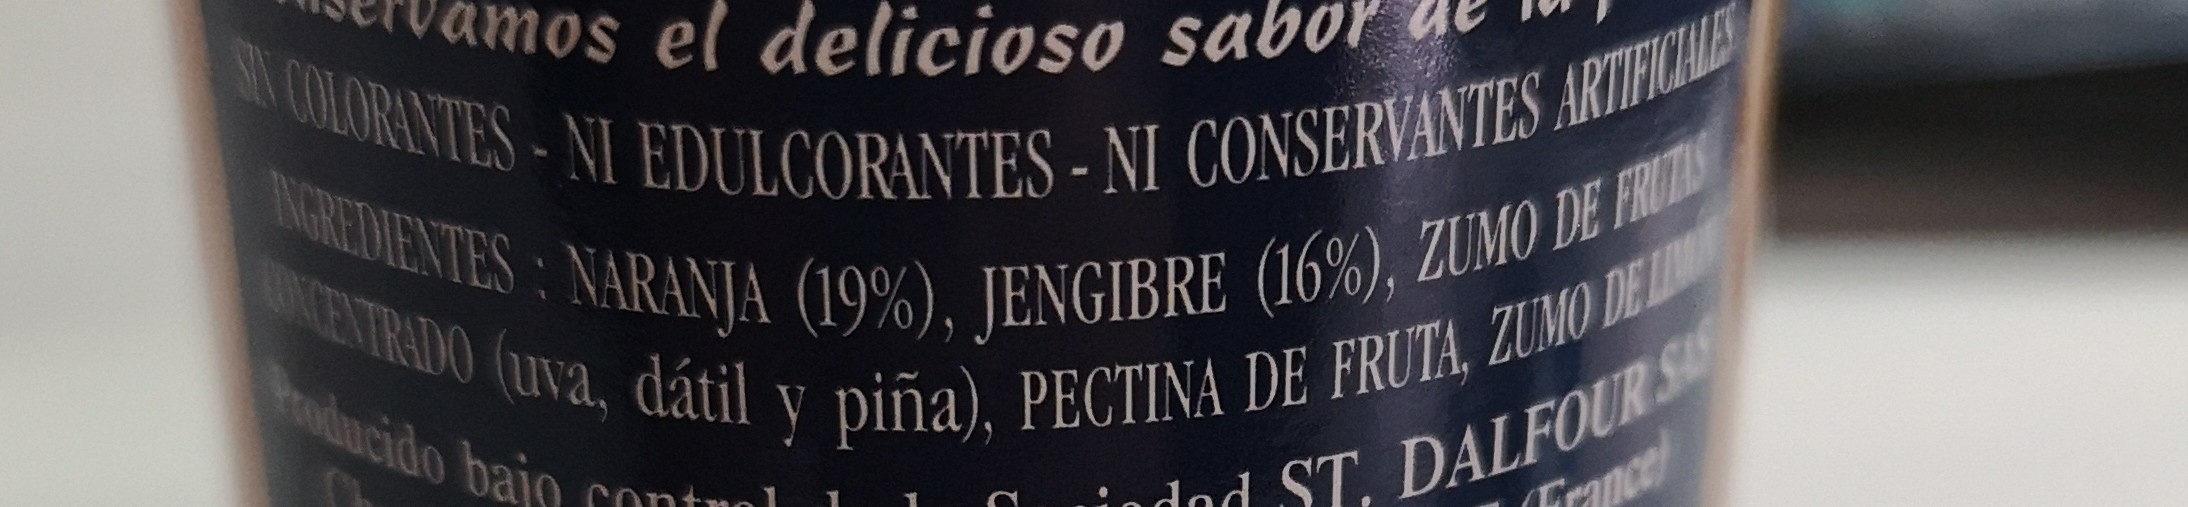 Rapsodia de frutas jengibre y naranja - Ingredients